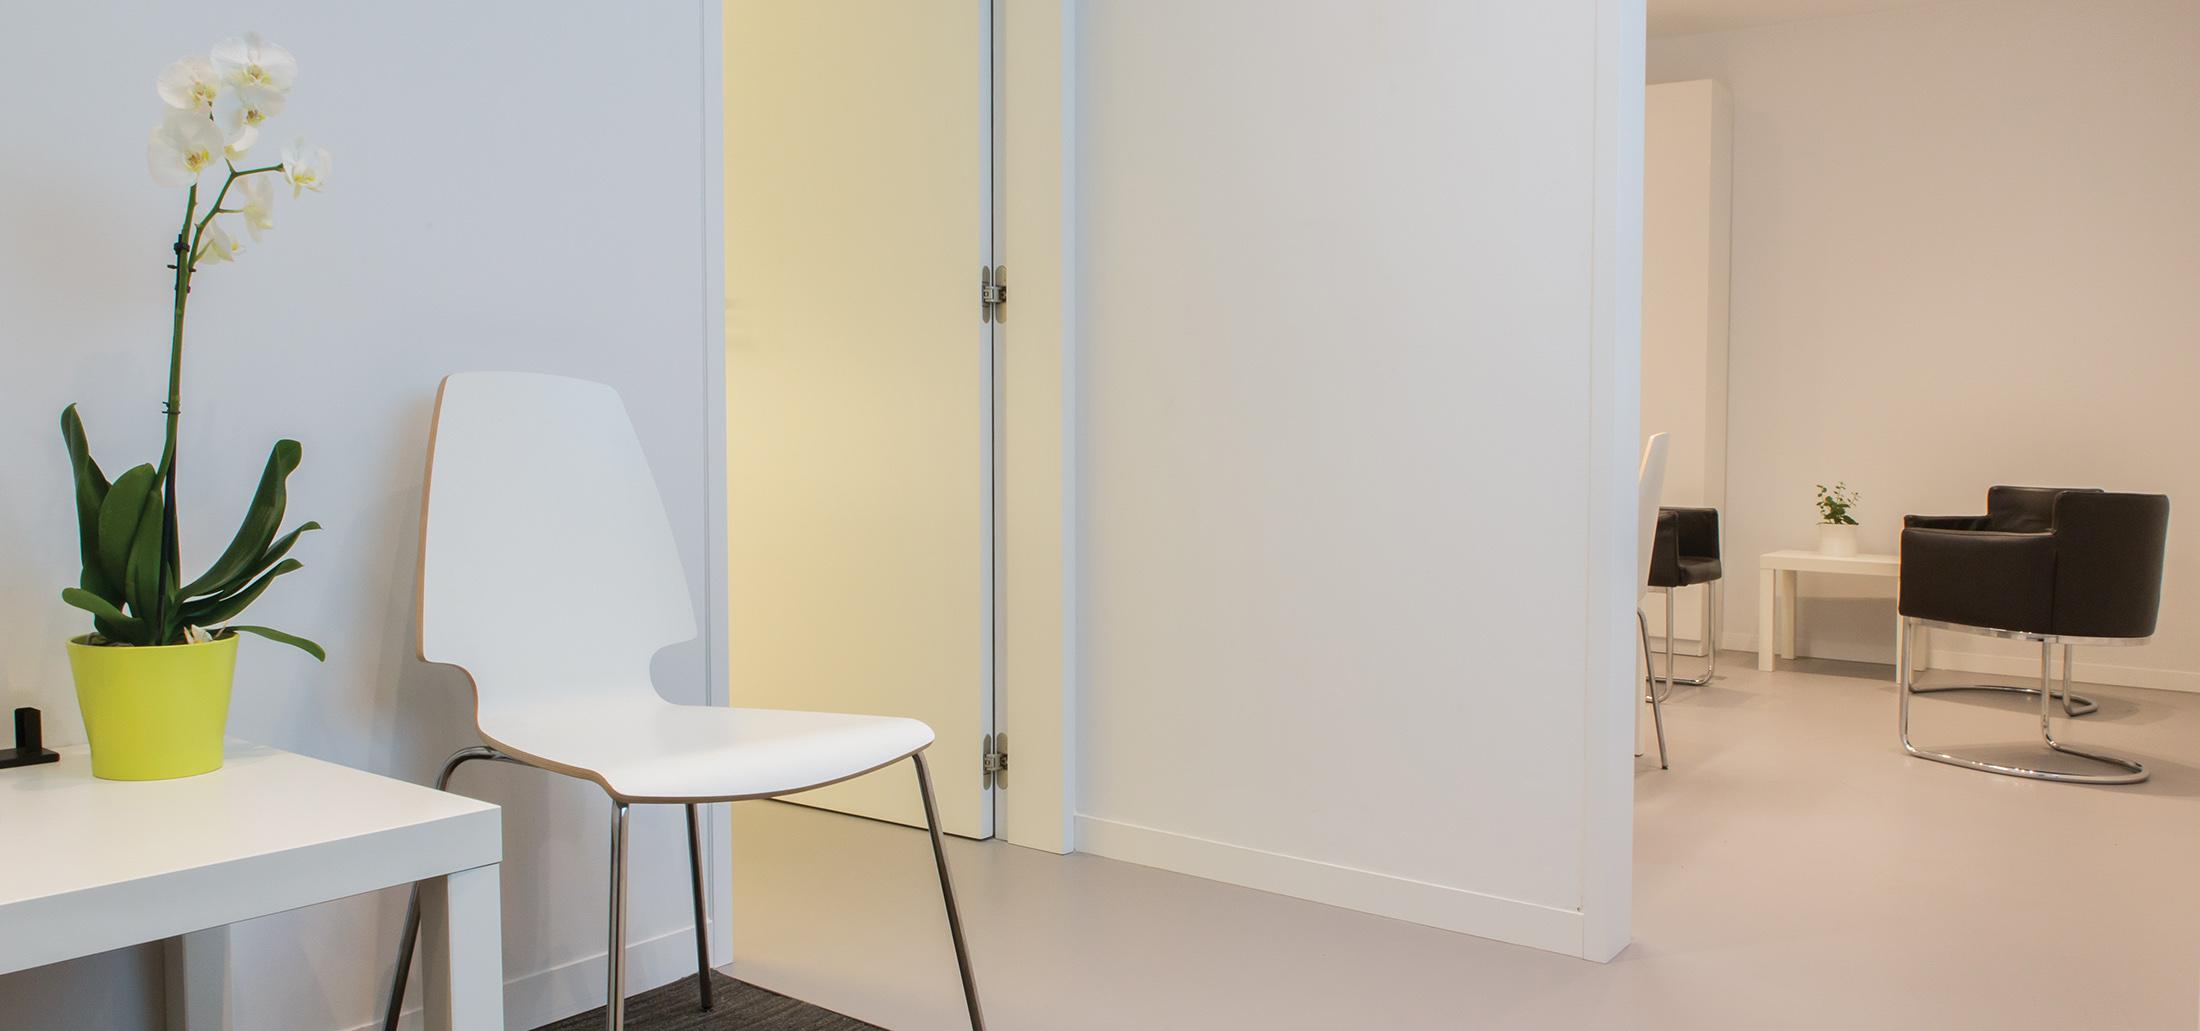 KinepraktijkMeise-interieur-03